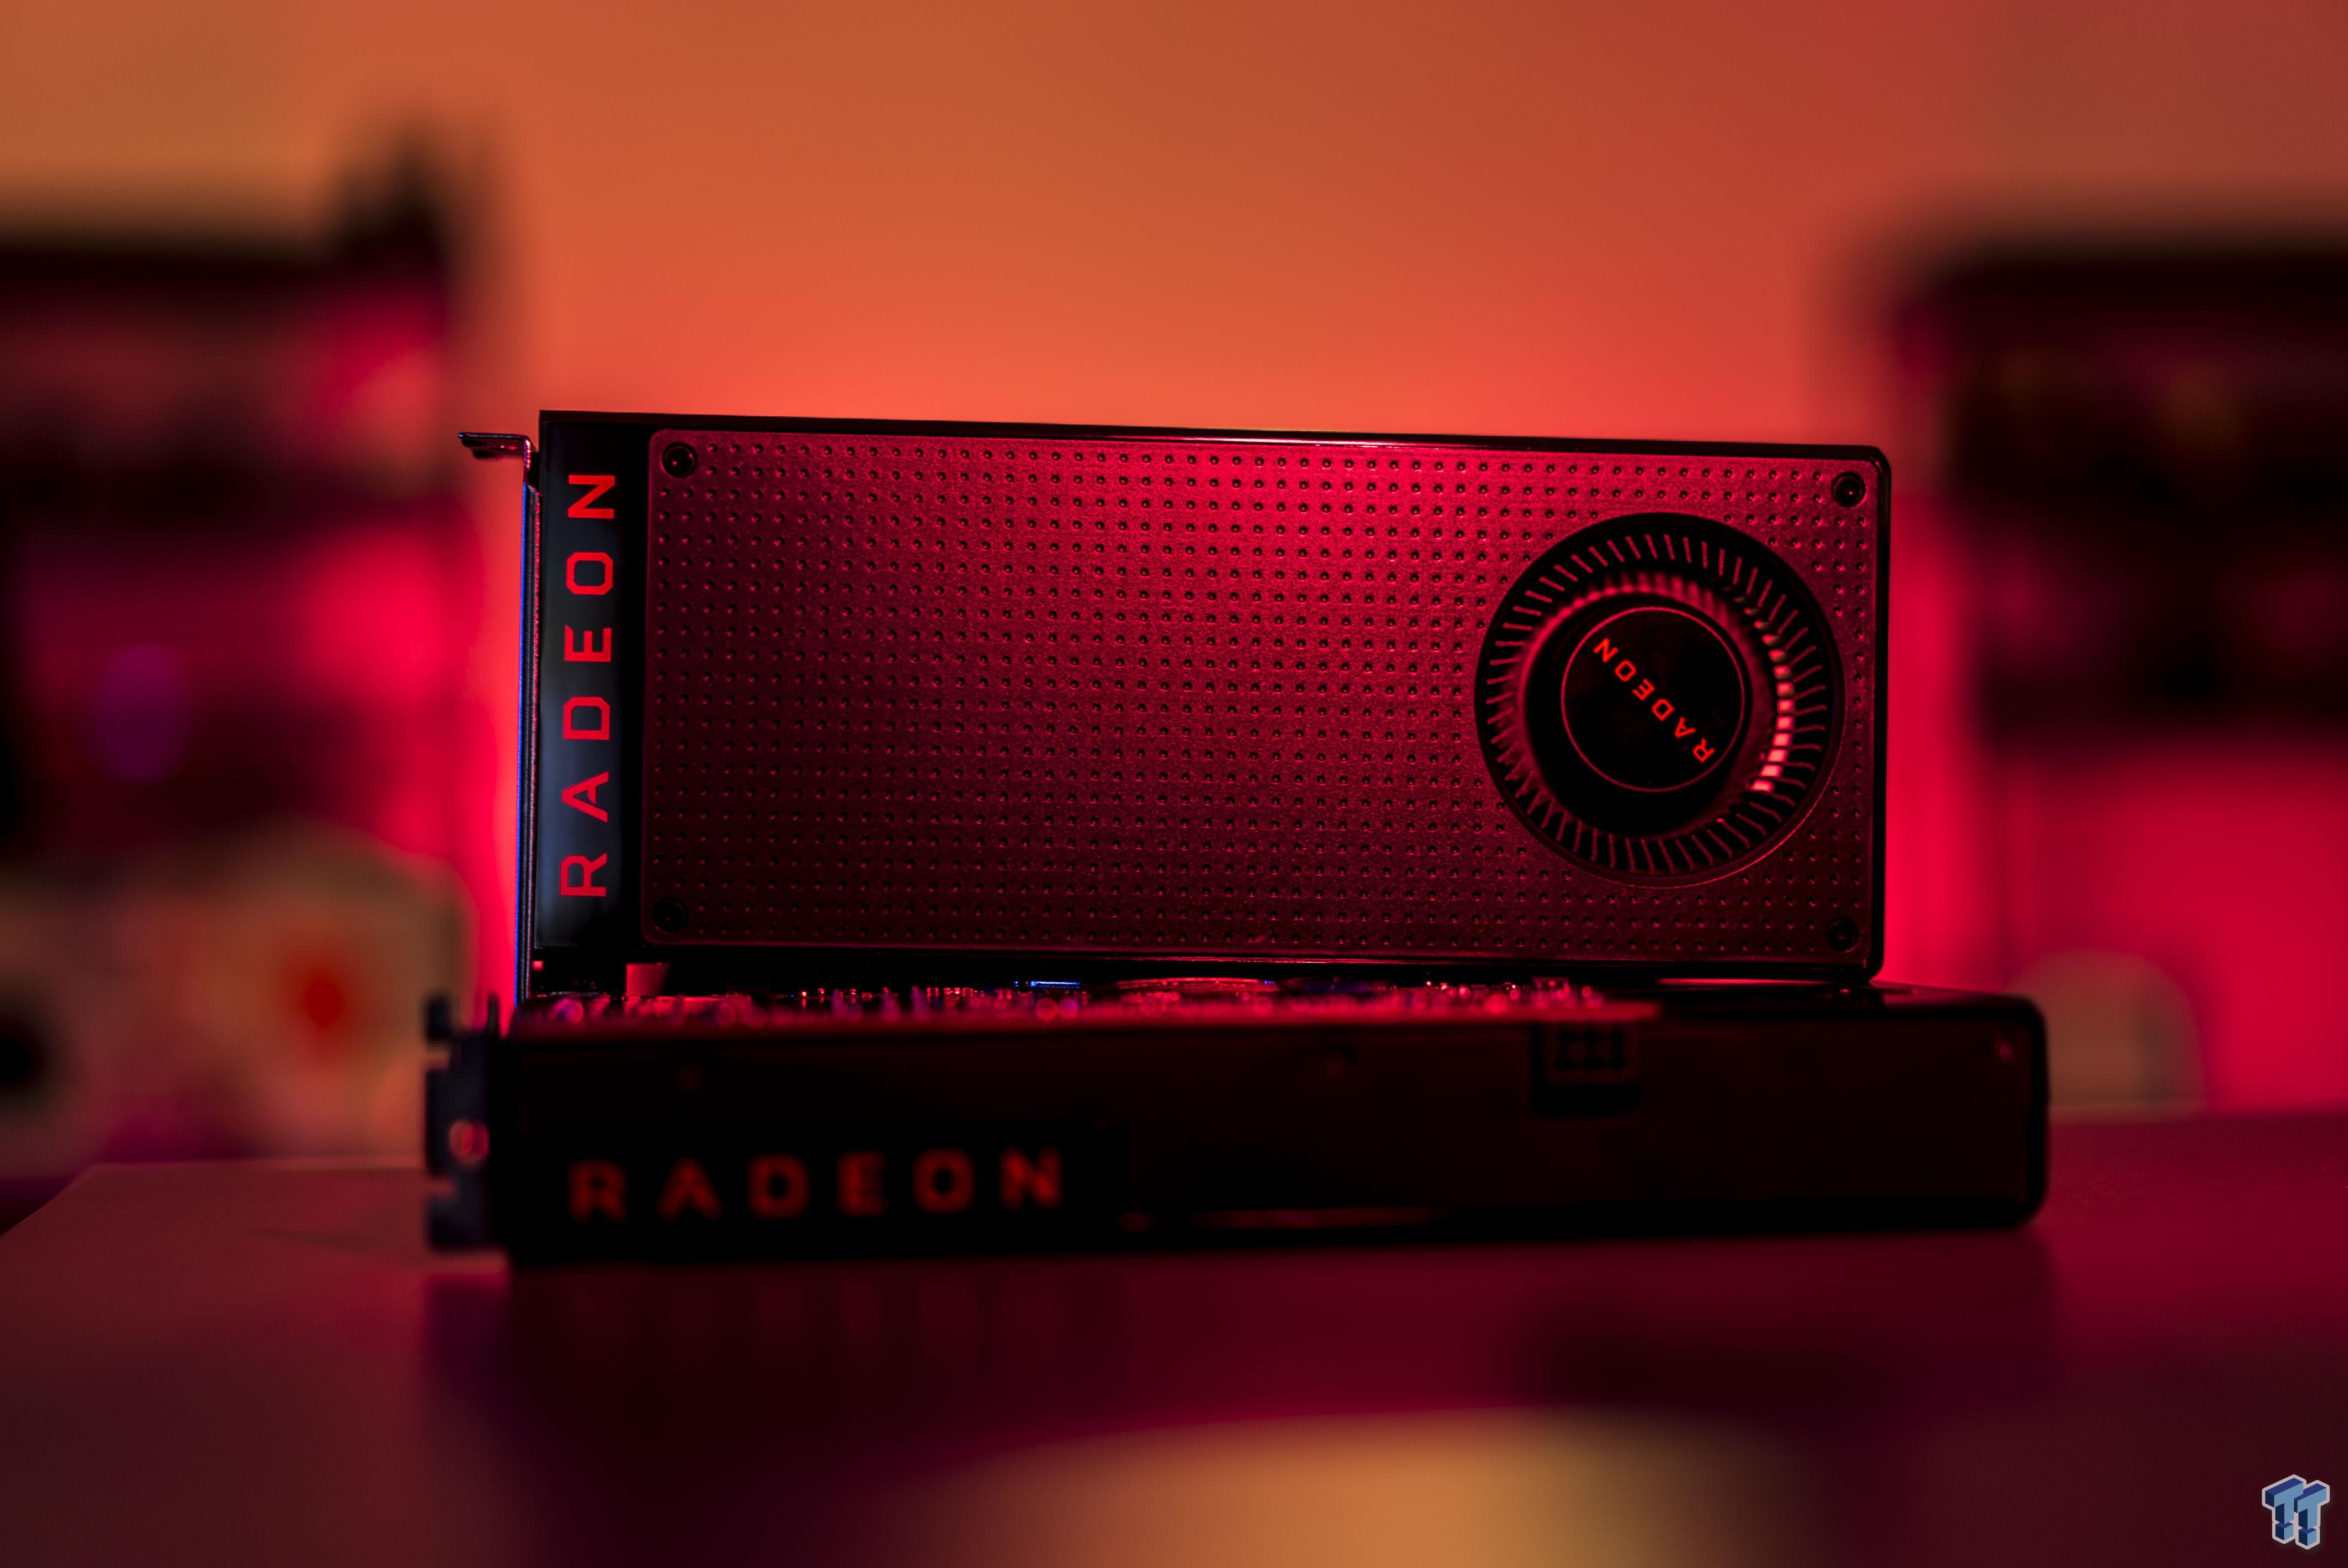 AMD's Radeon Software 16 7 1 drivers fix Radeon RX 480 power